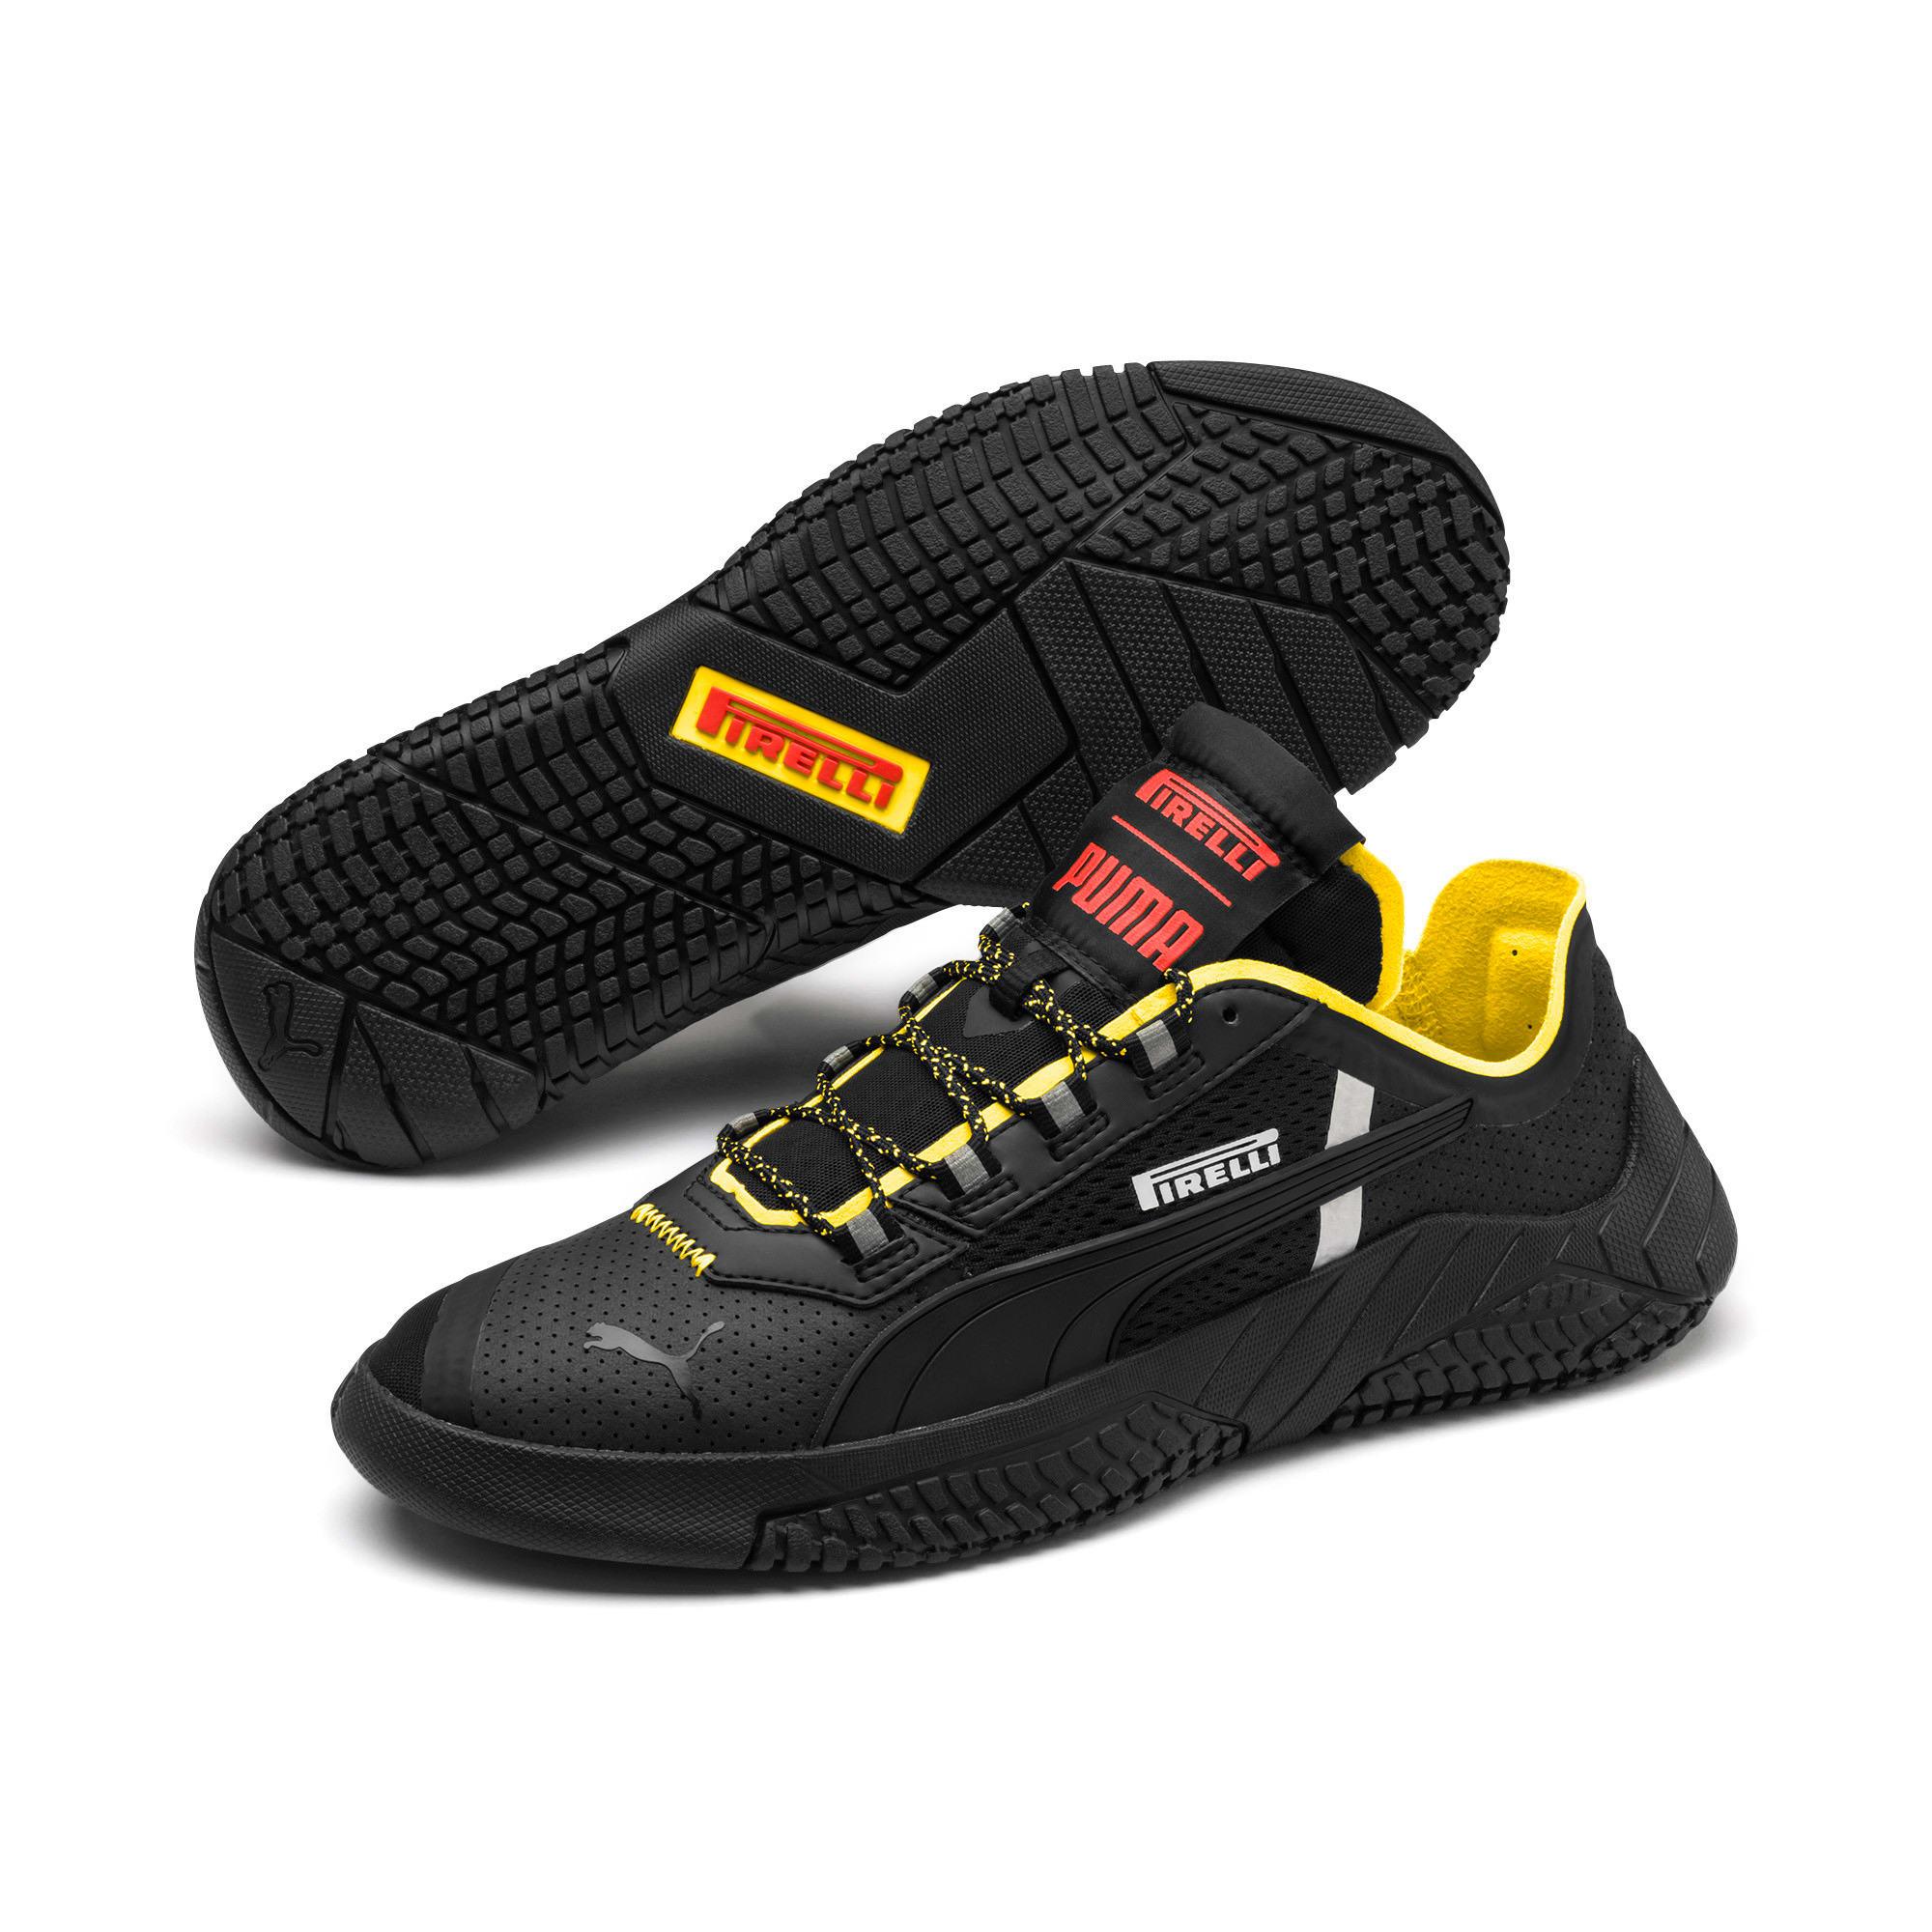 Thumbnail 2 of Replicat-X Pirelli Motorsport Shoes, Black-Black-Cyber Yellow, medium